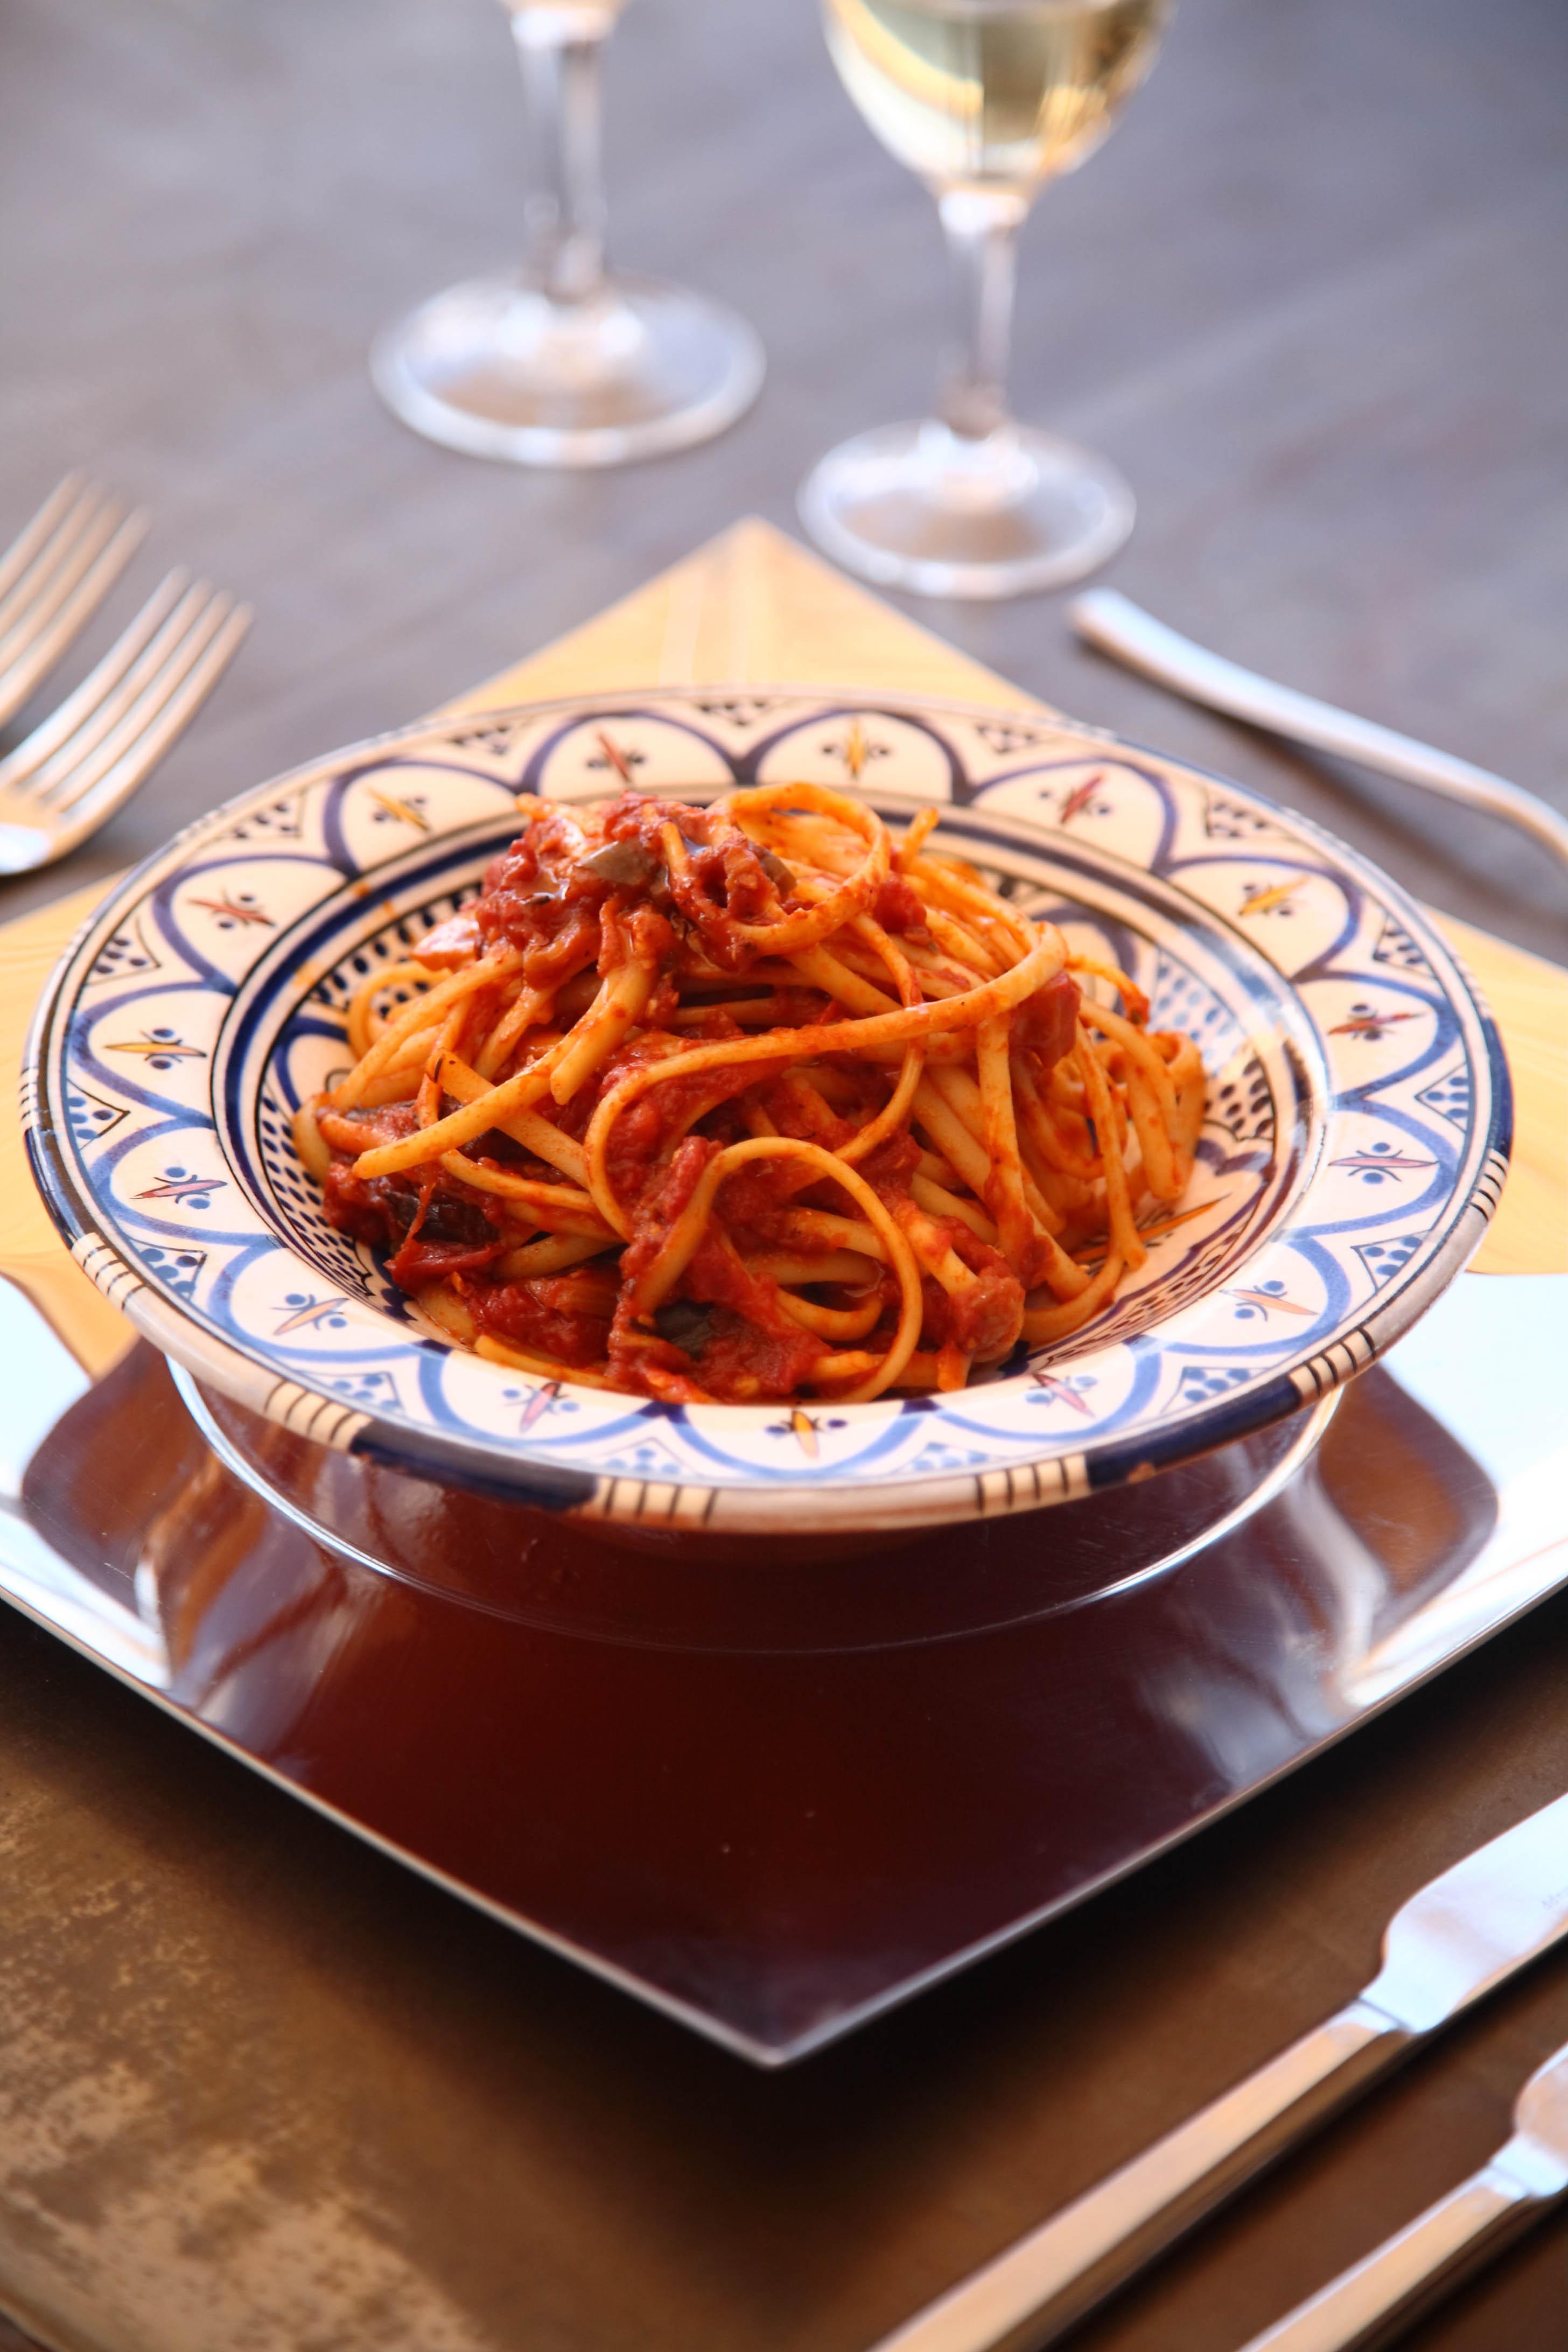 Fresh Italian pastas